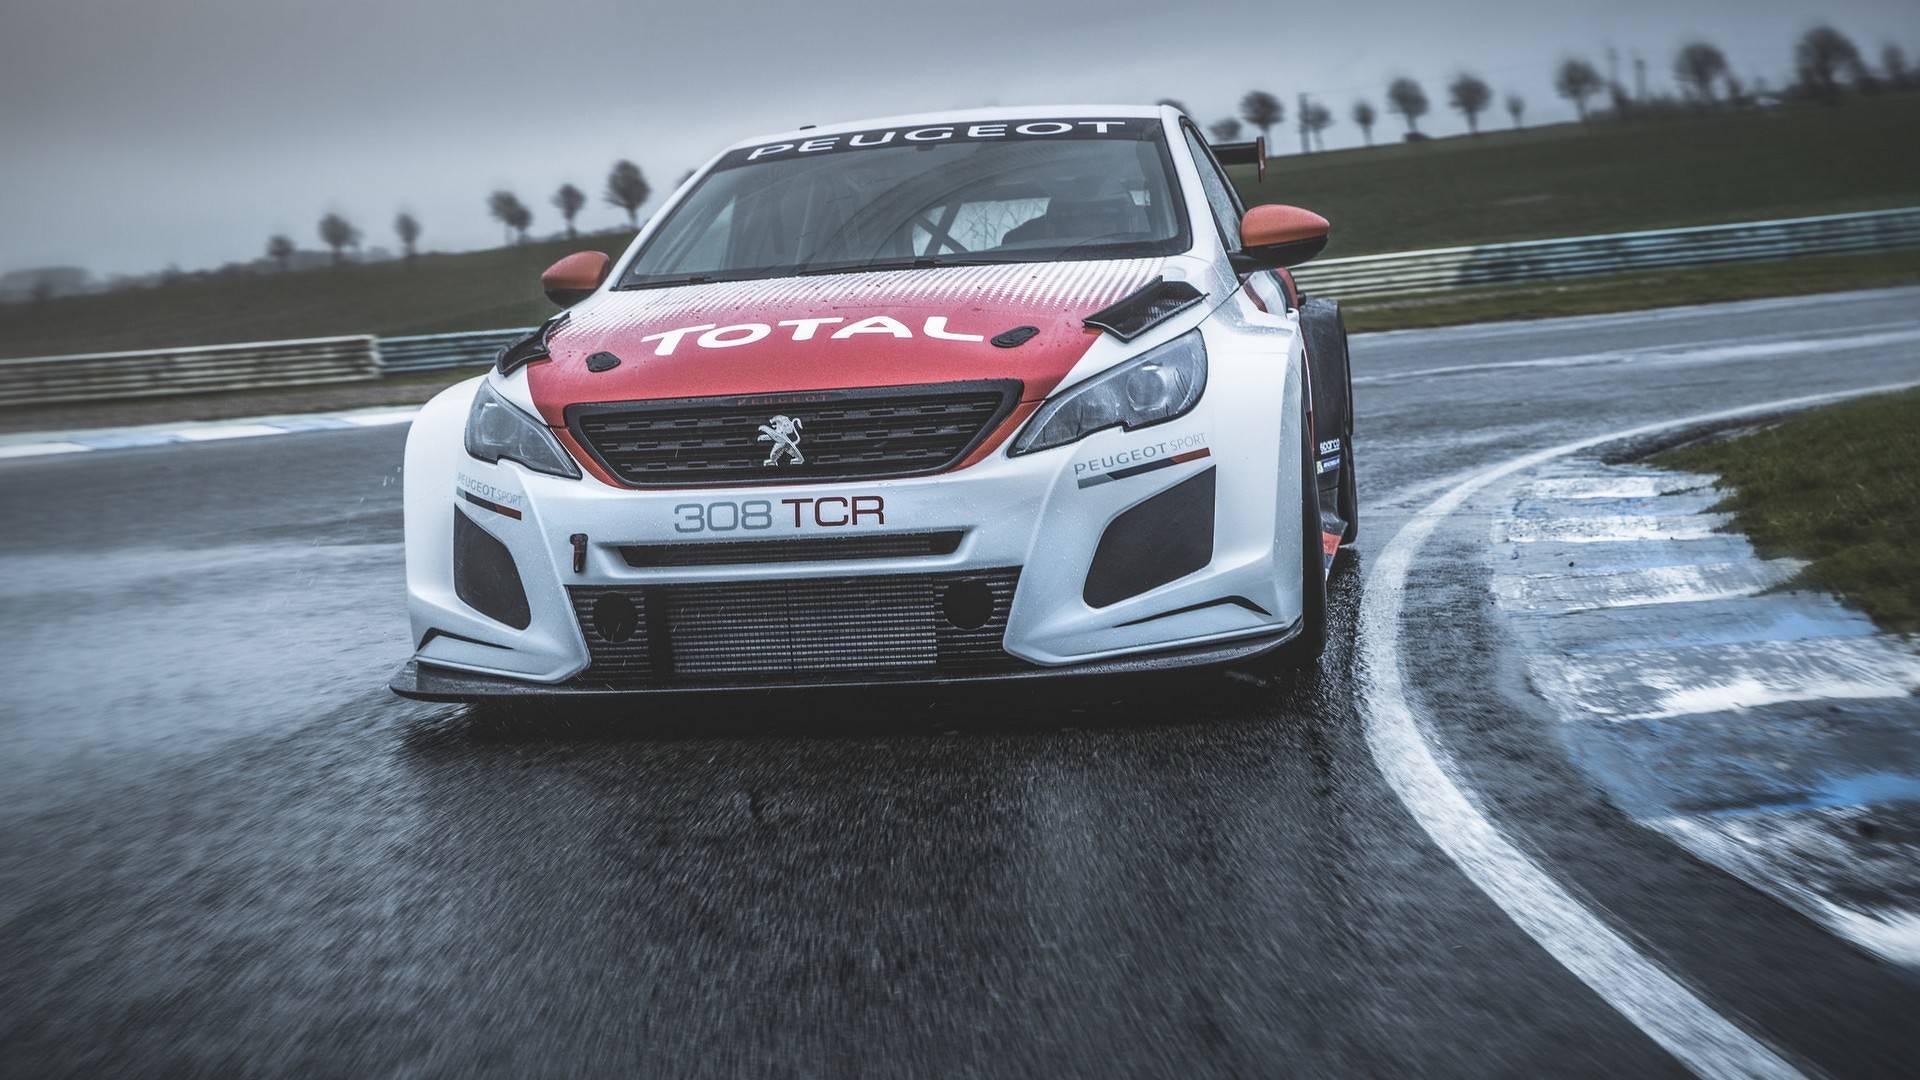 Peugeot 308 TCR 2018 (4)